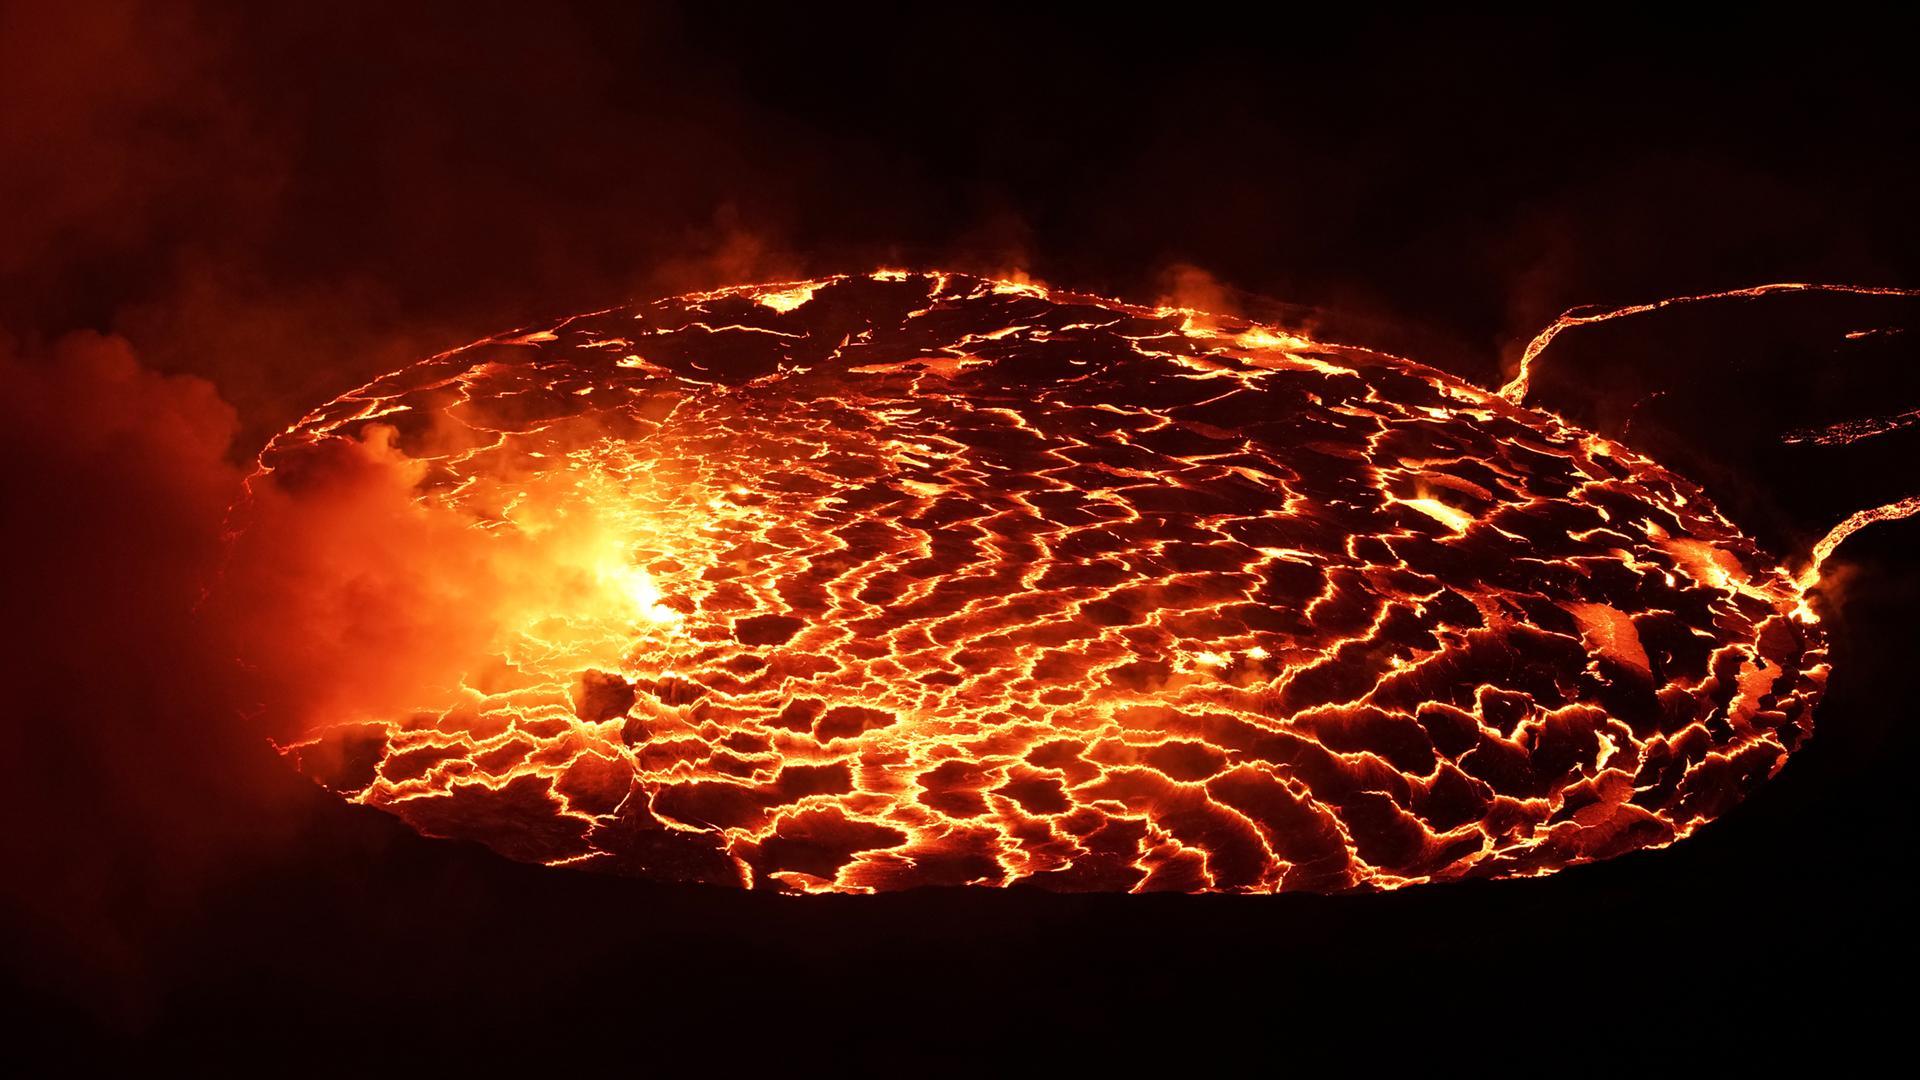 Lavasee im Krater des Nyiragongo